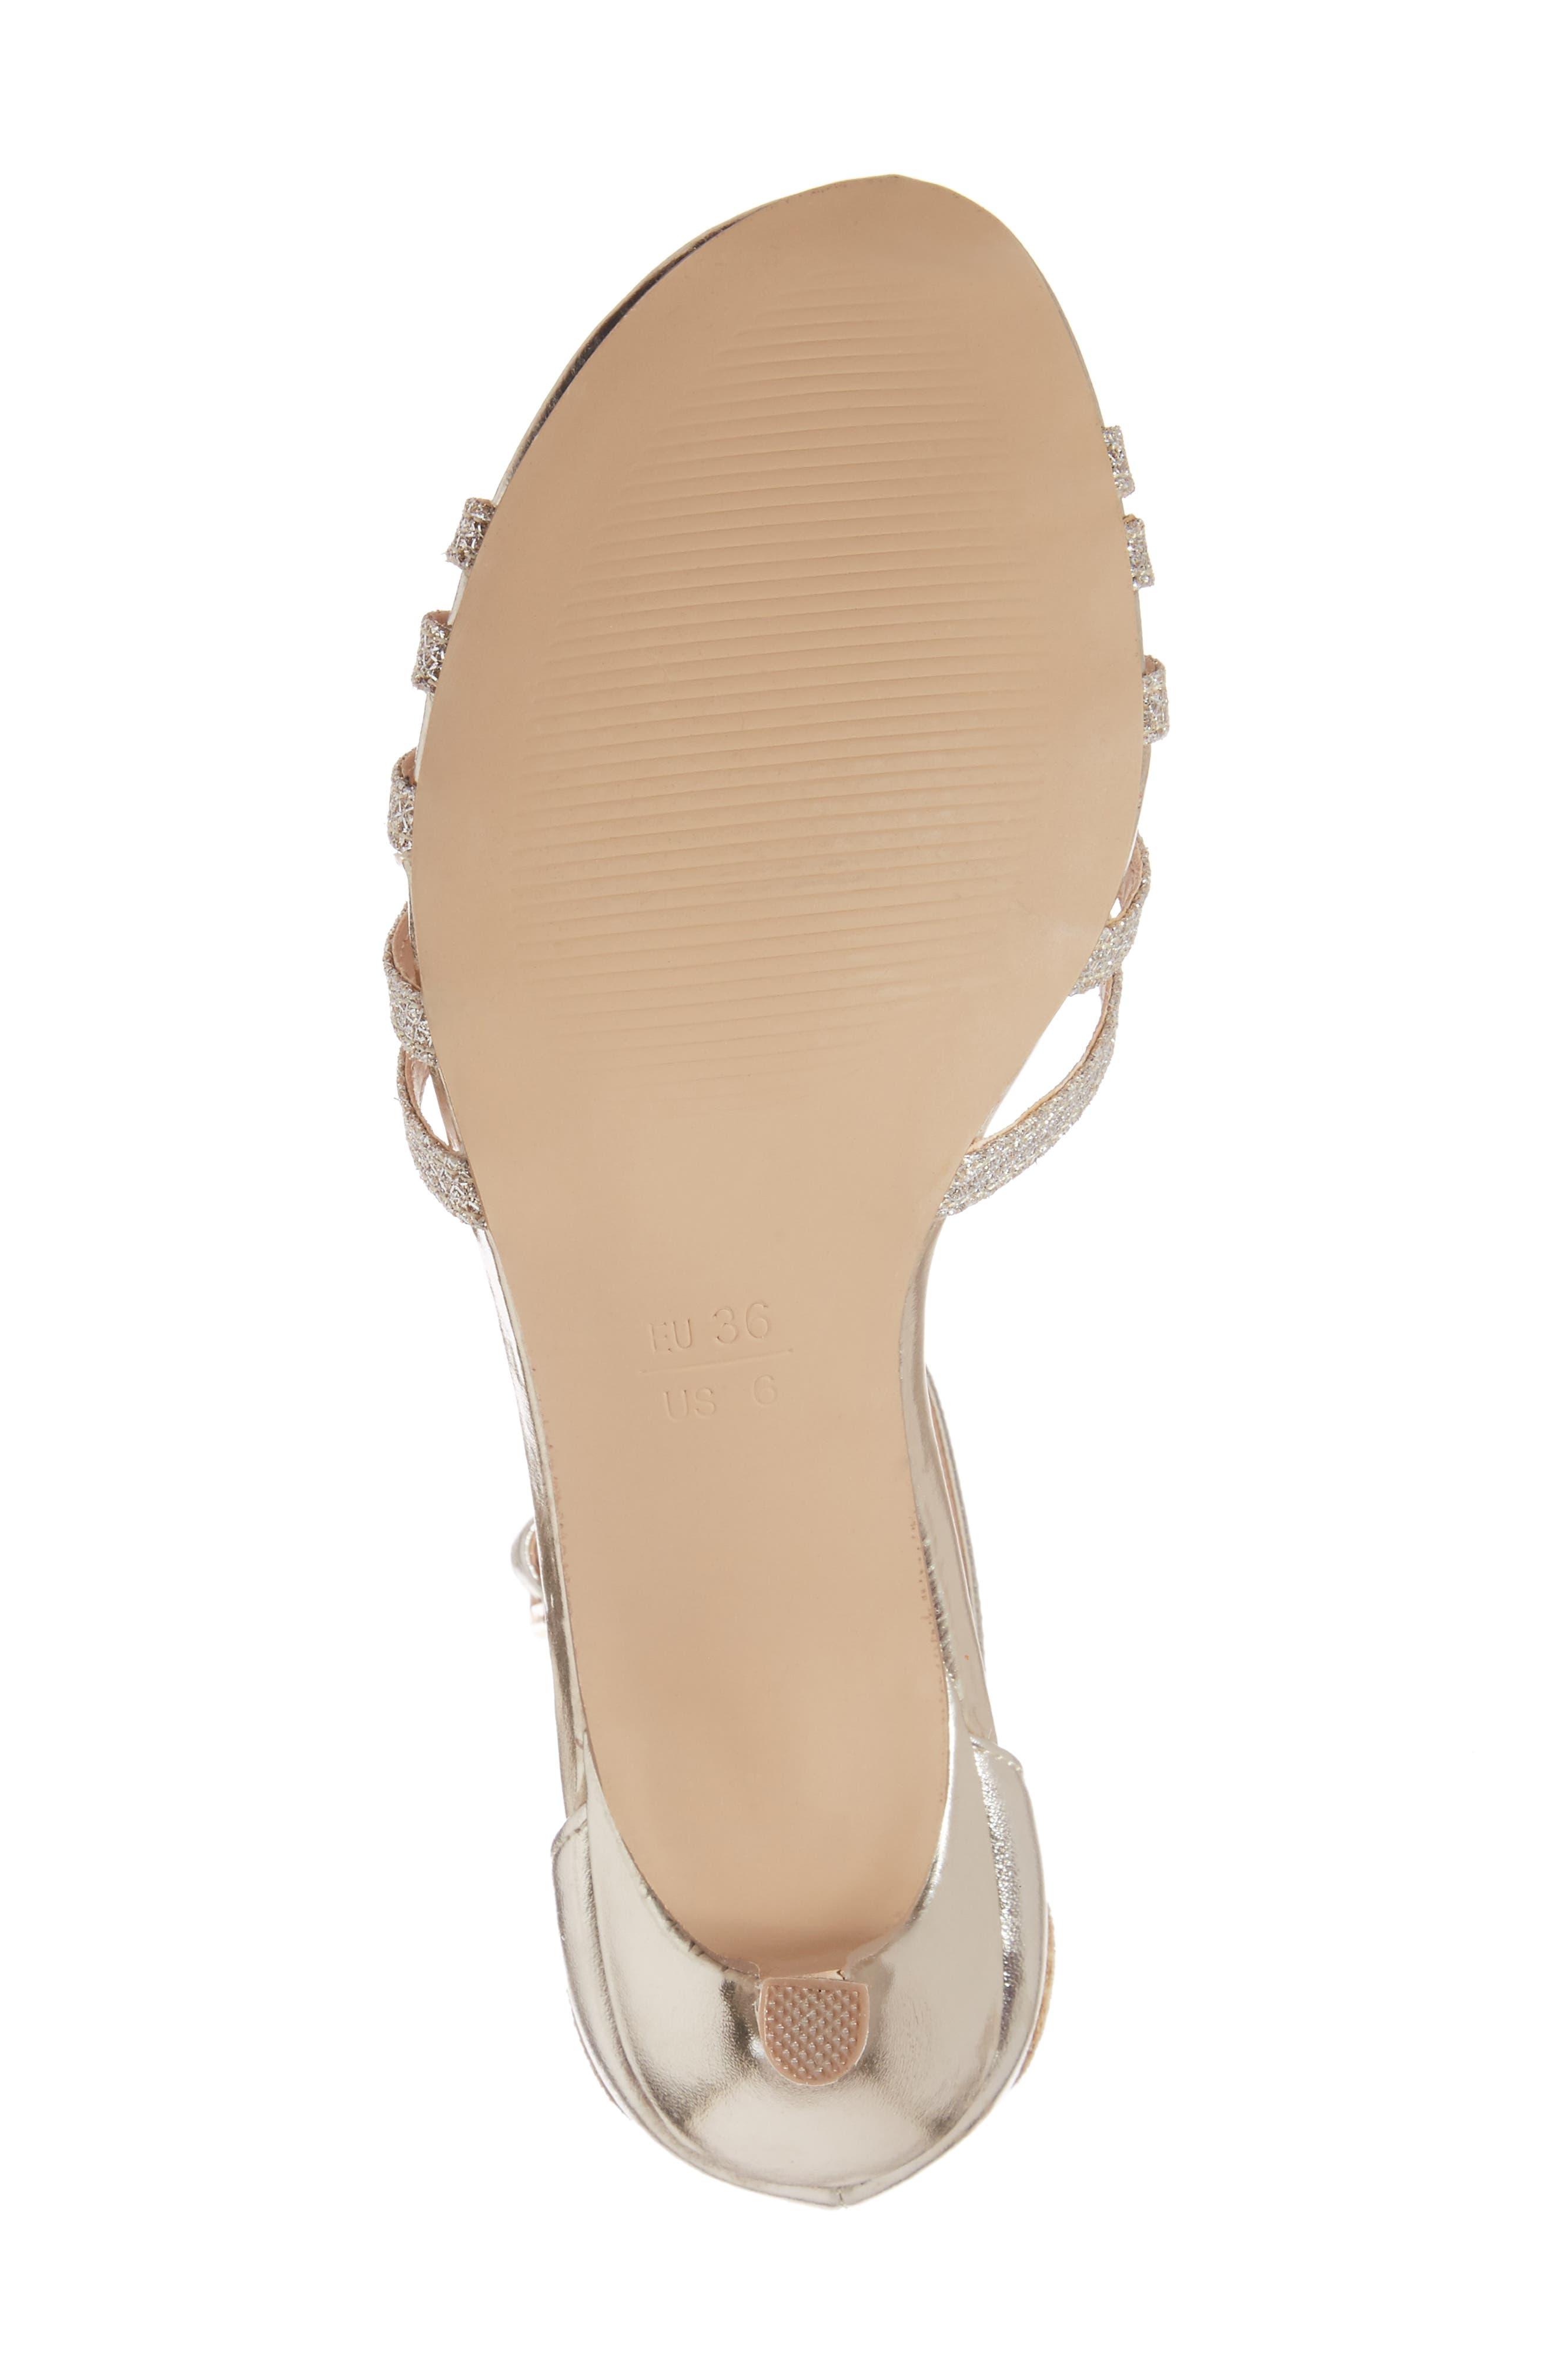 Melby Ankle Strap Sandal,                             Alternate thumbnail 6, color,                             Champagne